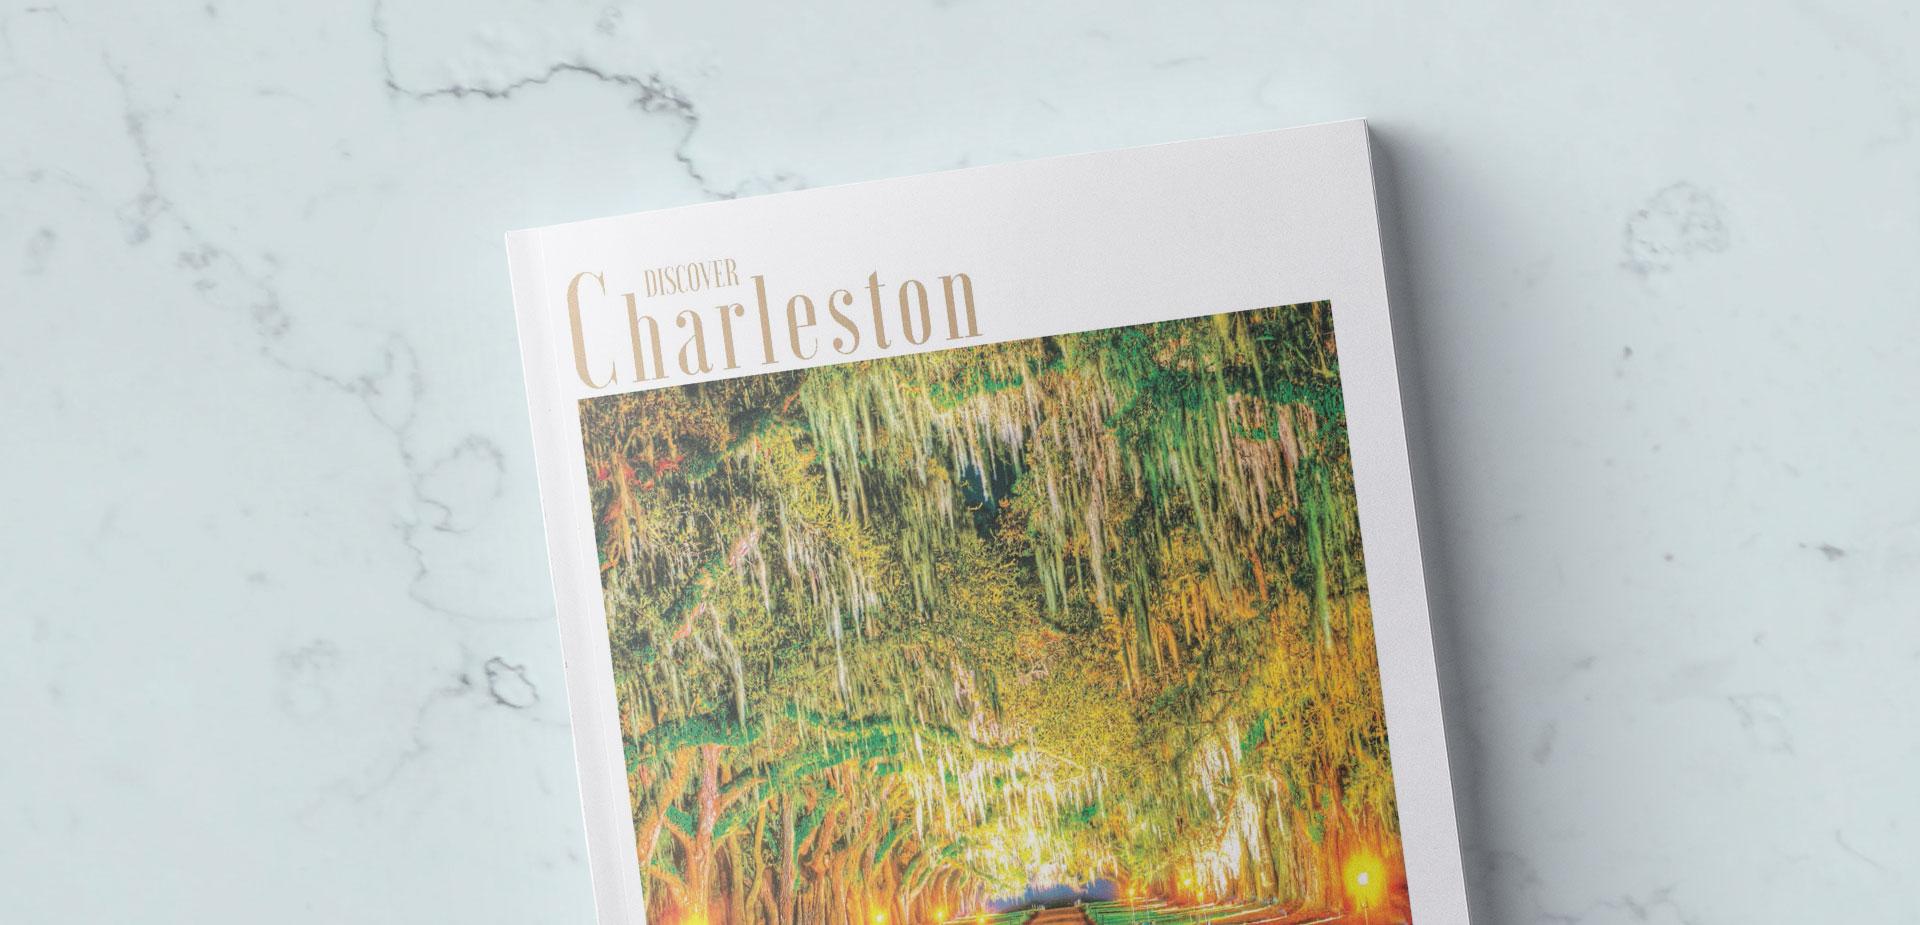 Discover-Charleston